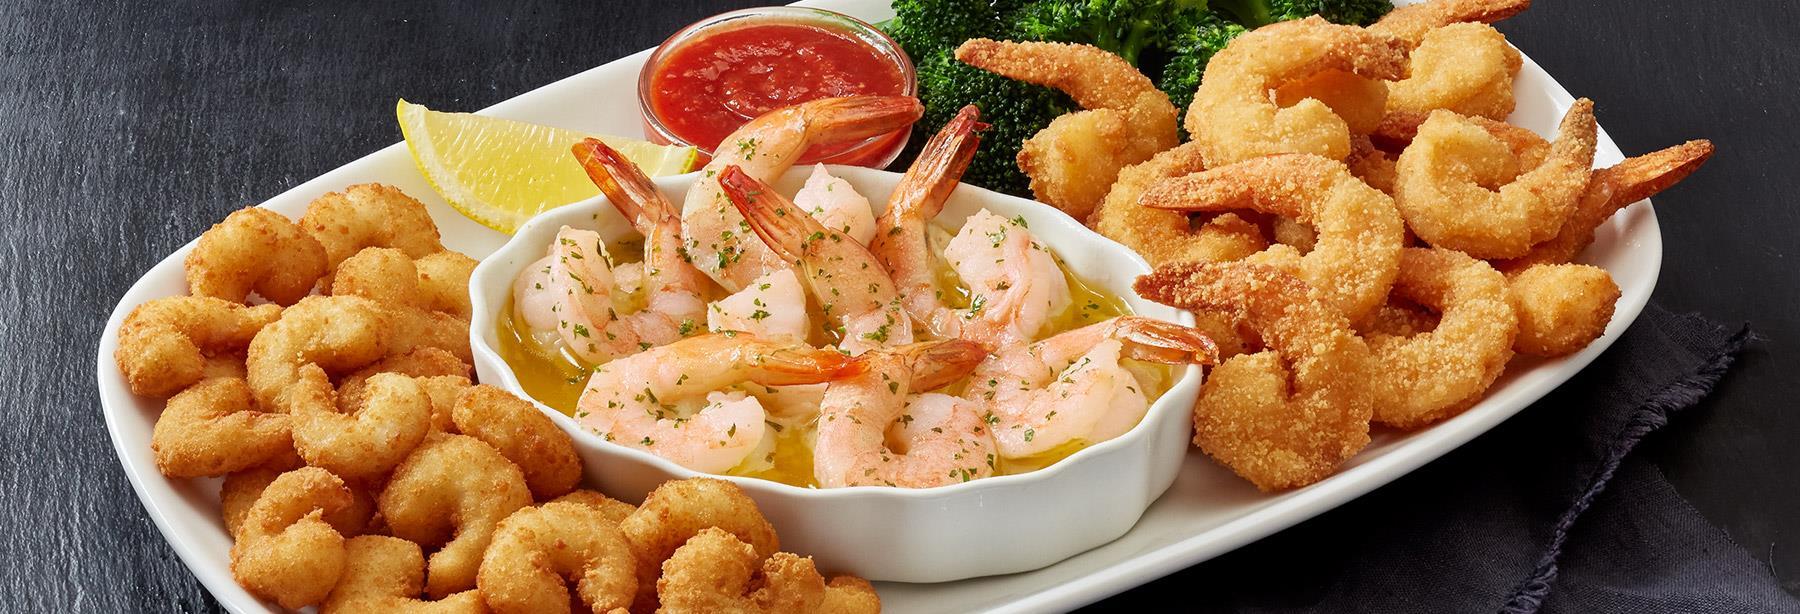 Shrimp Your Way | Red Lobster Seafood Restaurants